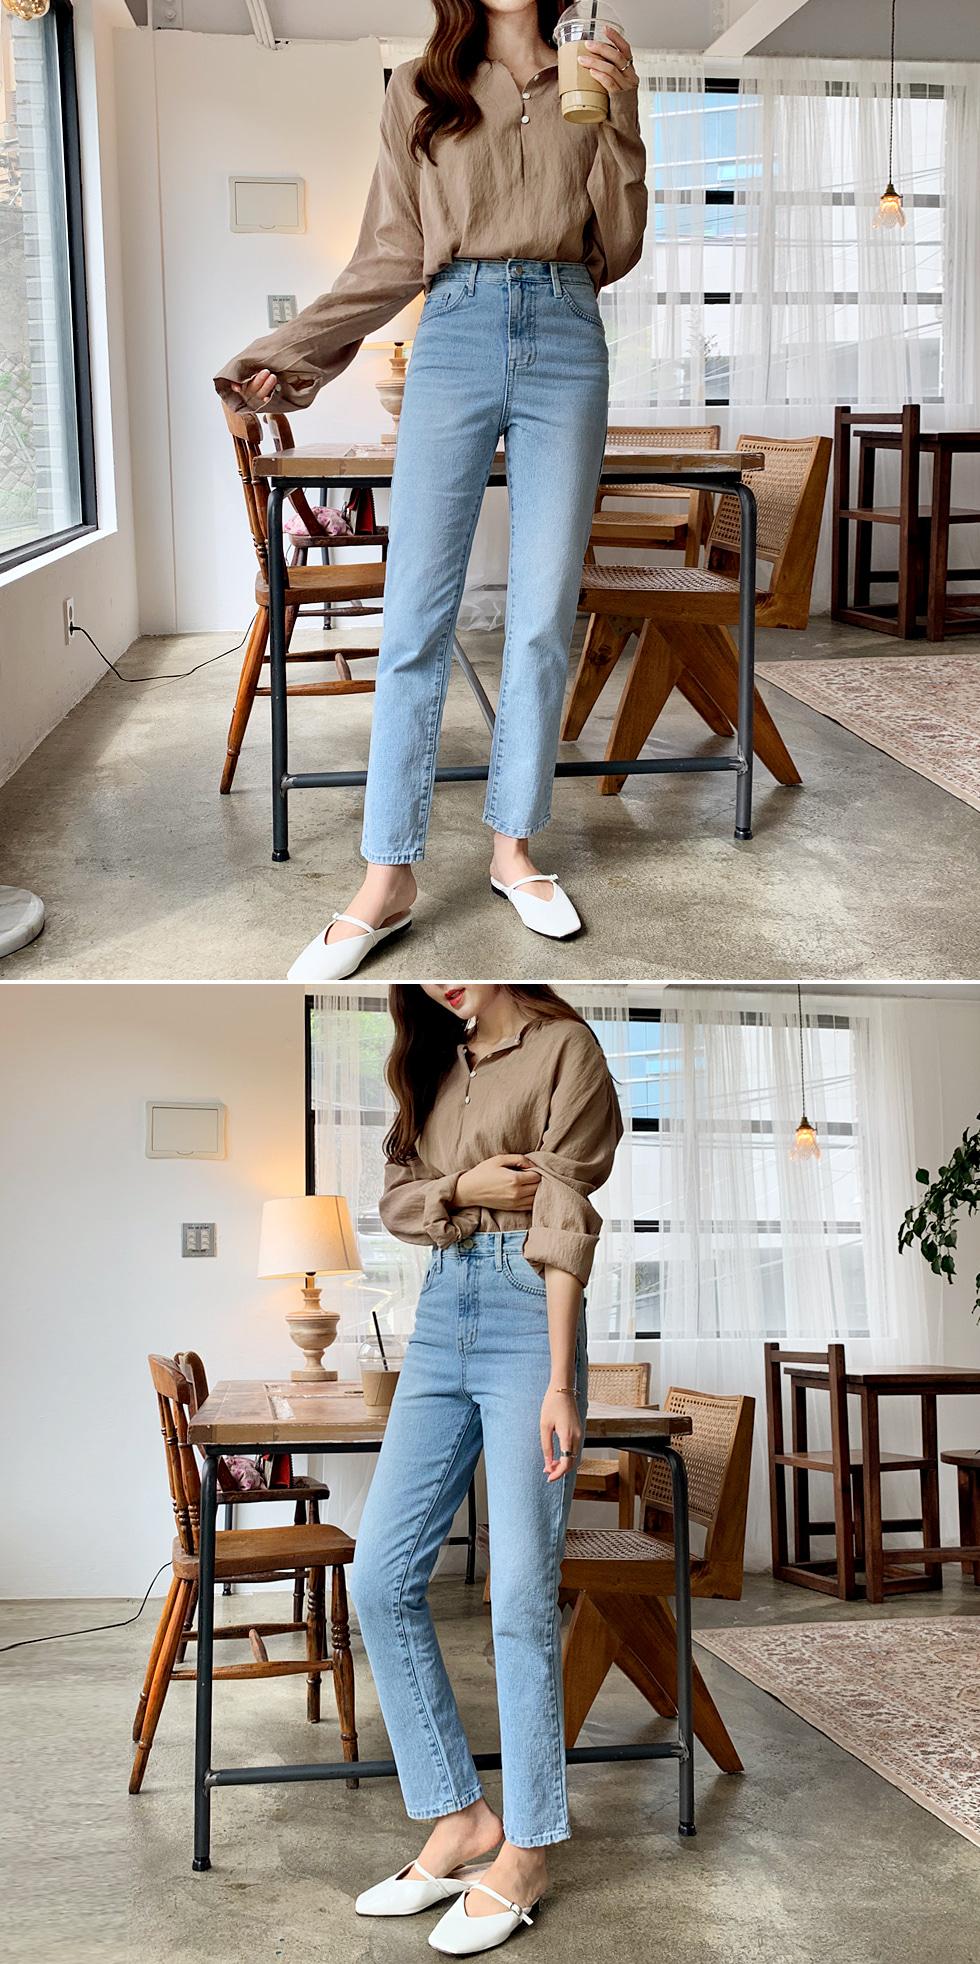 Mini button blouse